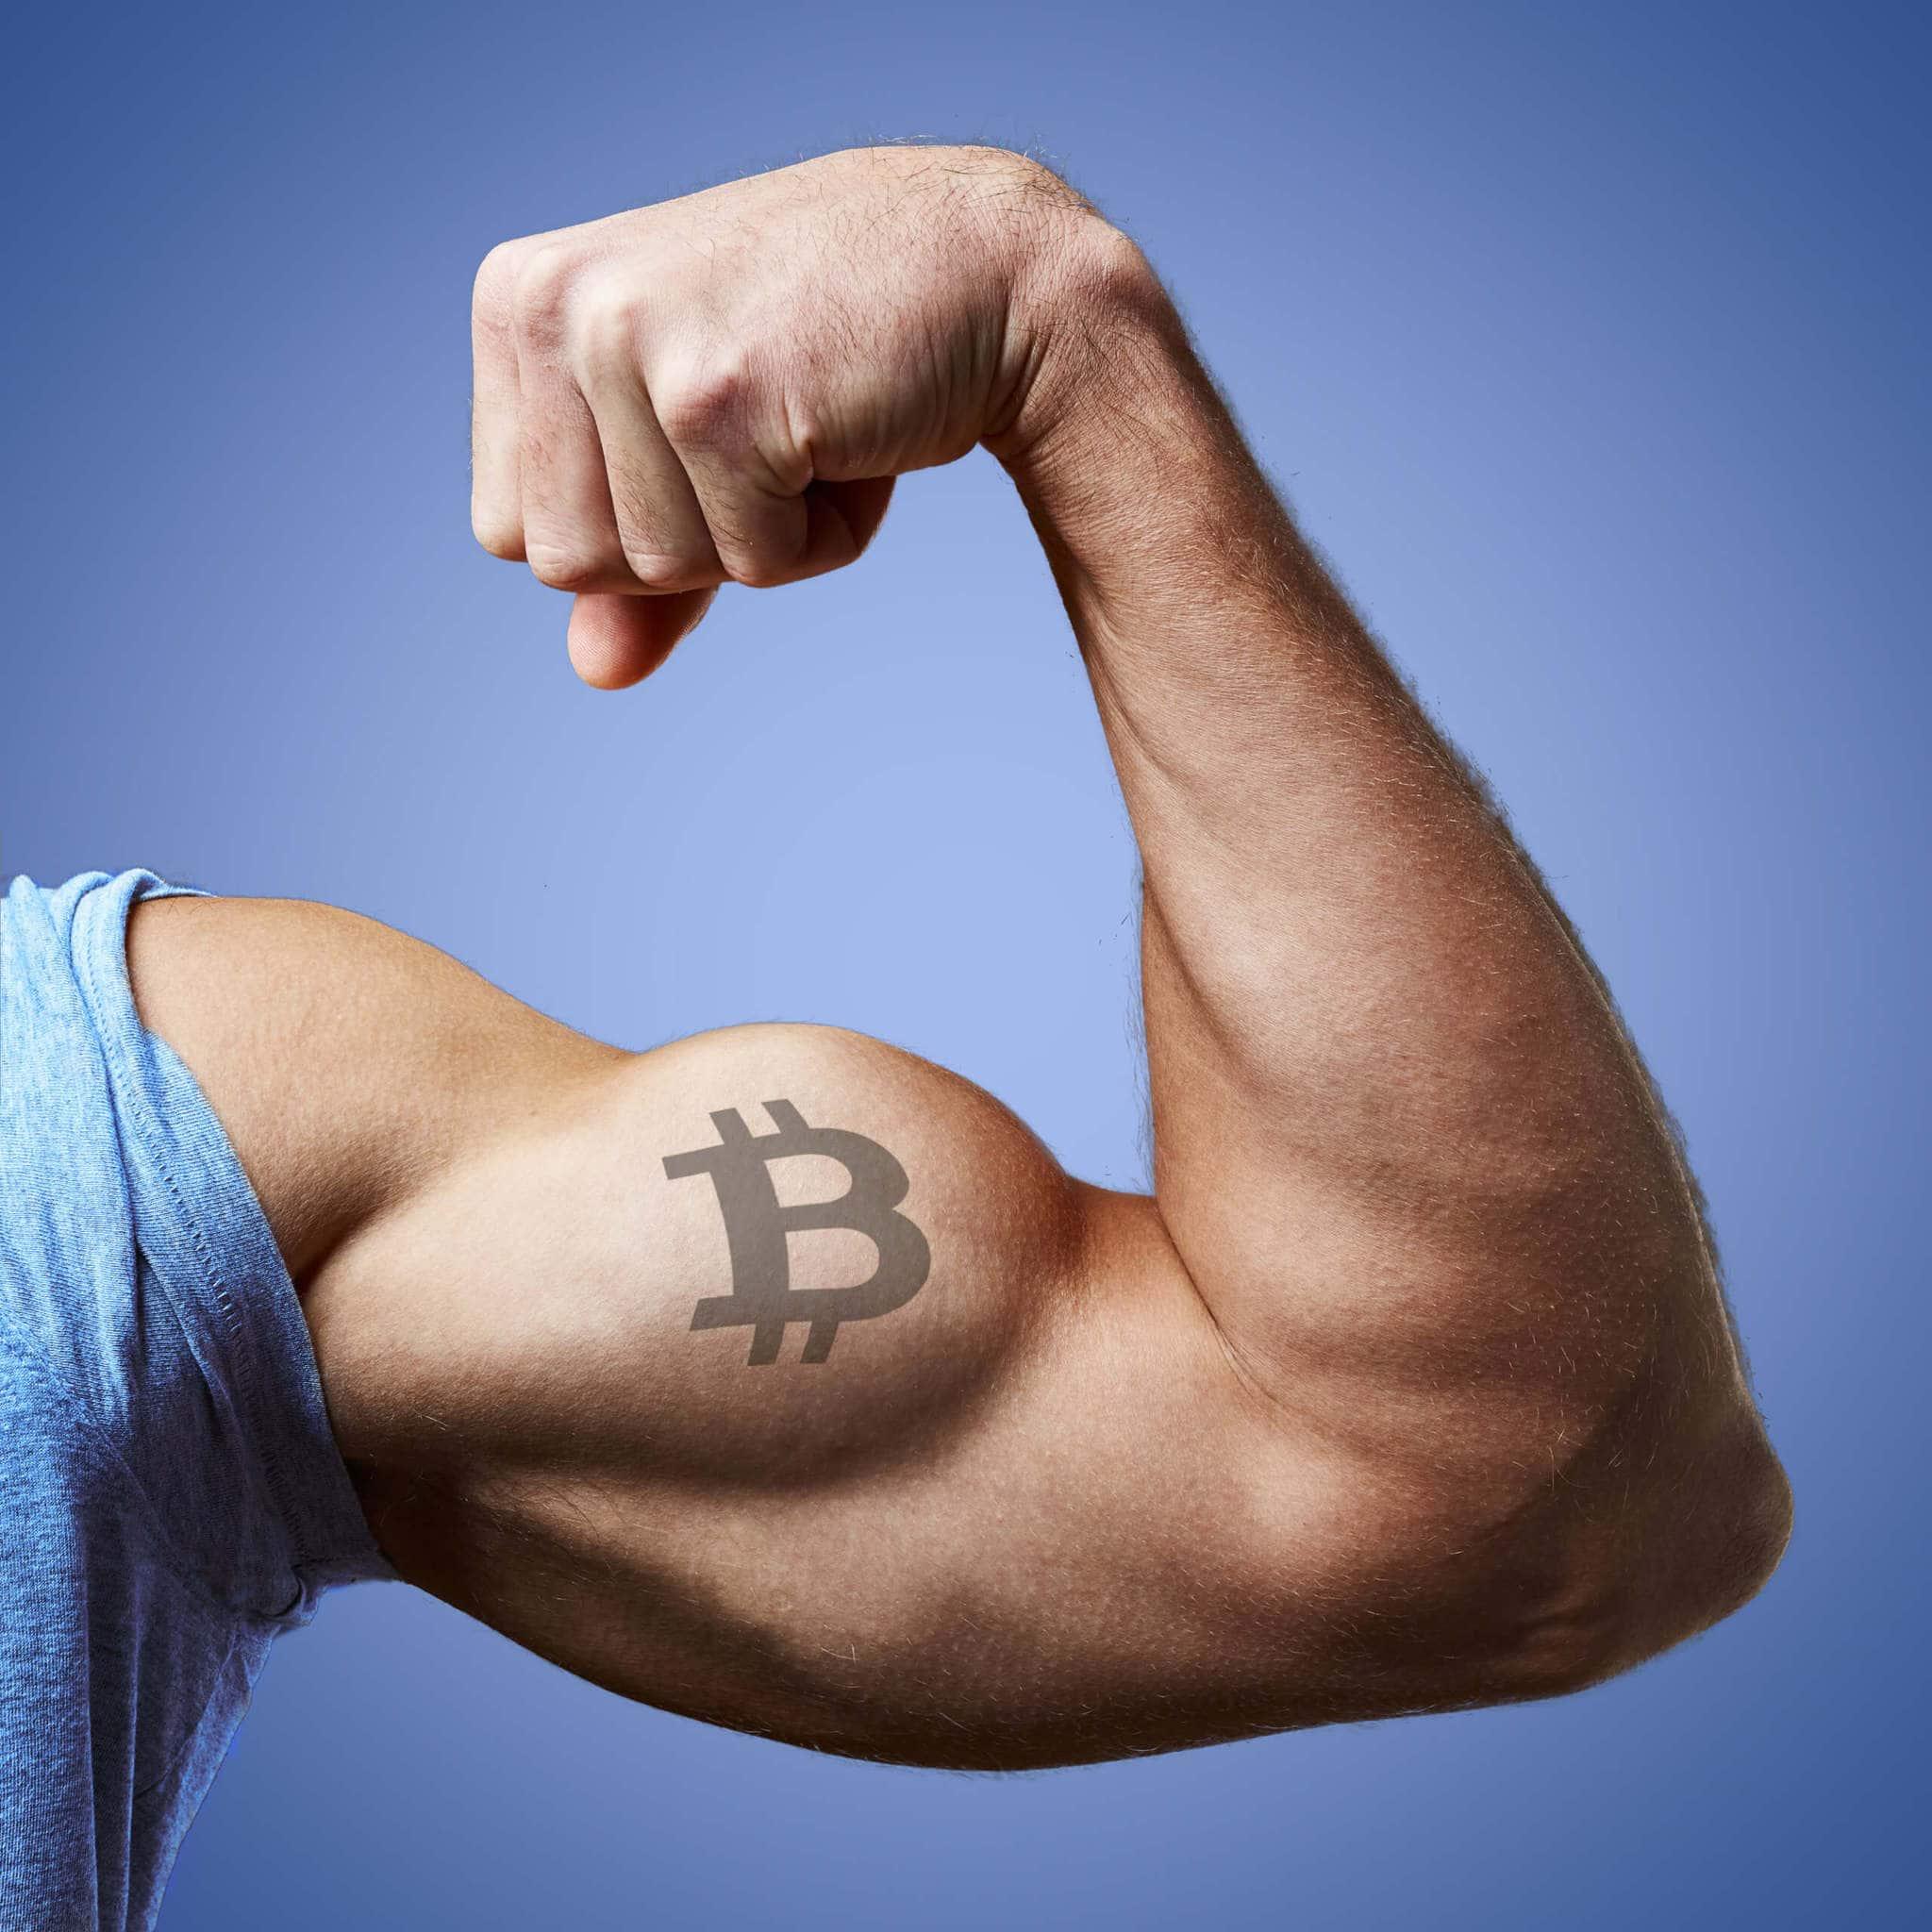 Bitcoin Tattoo auf Bizeps - Bitcoin-Kurs im Aufwind?